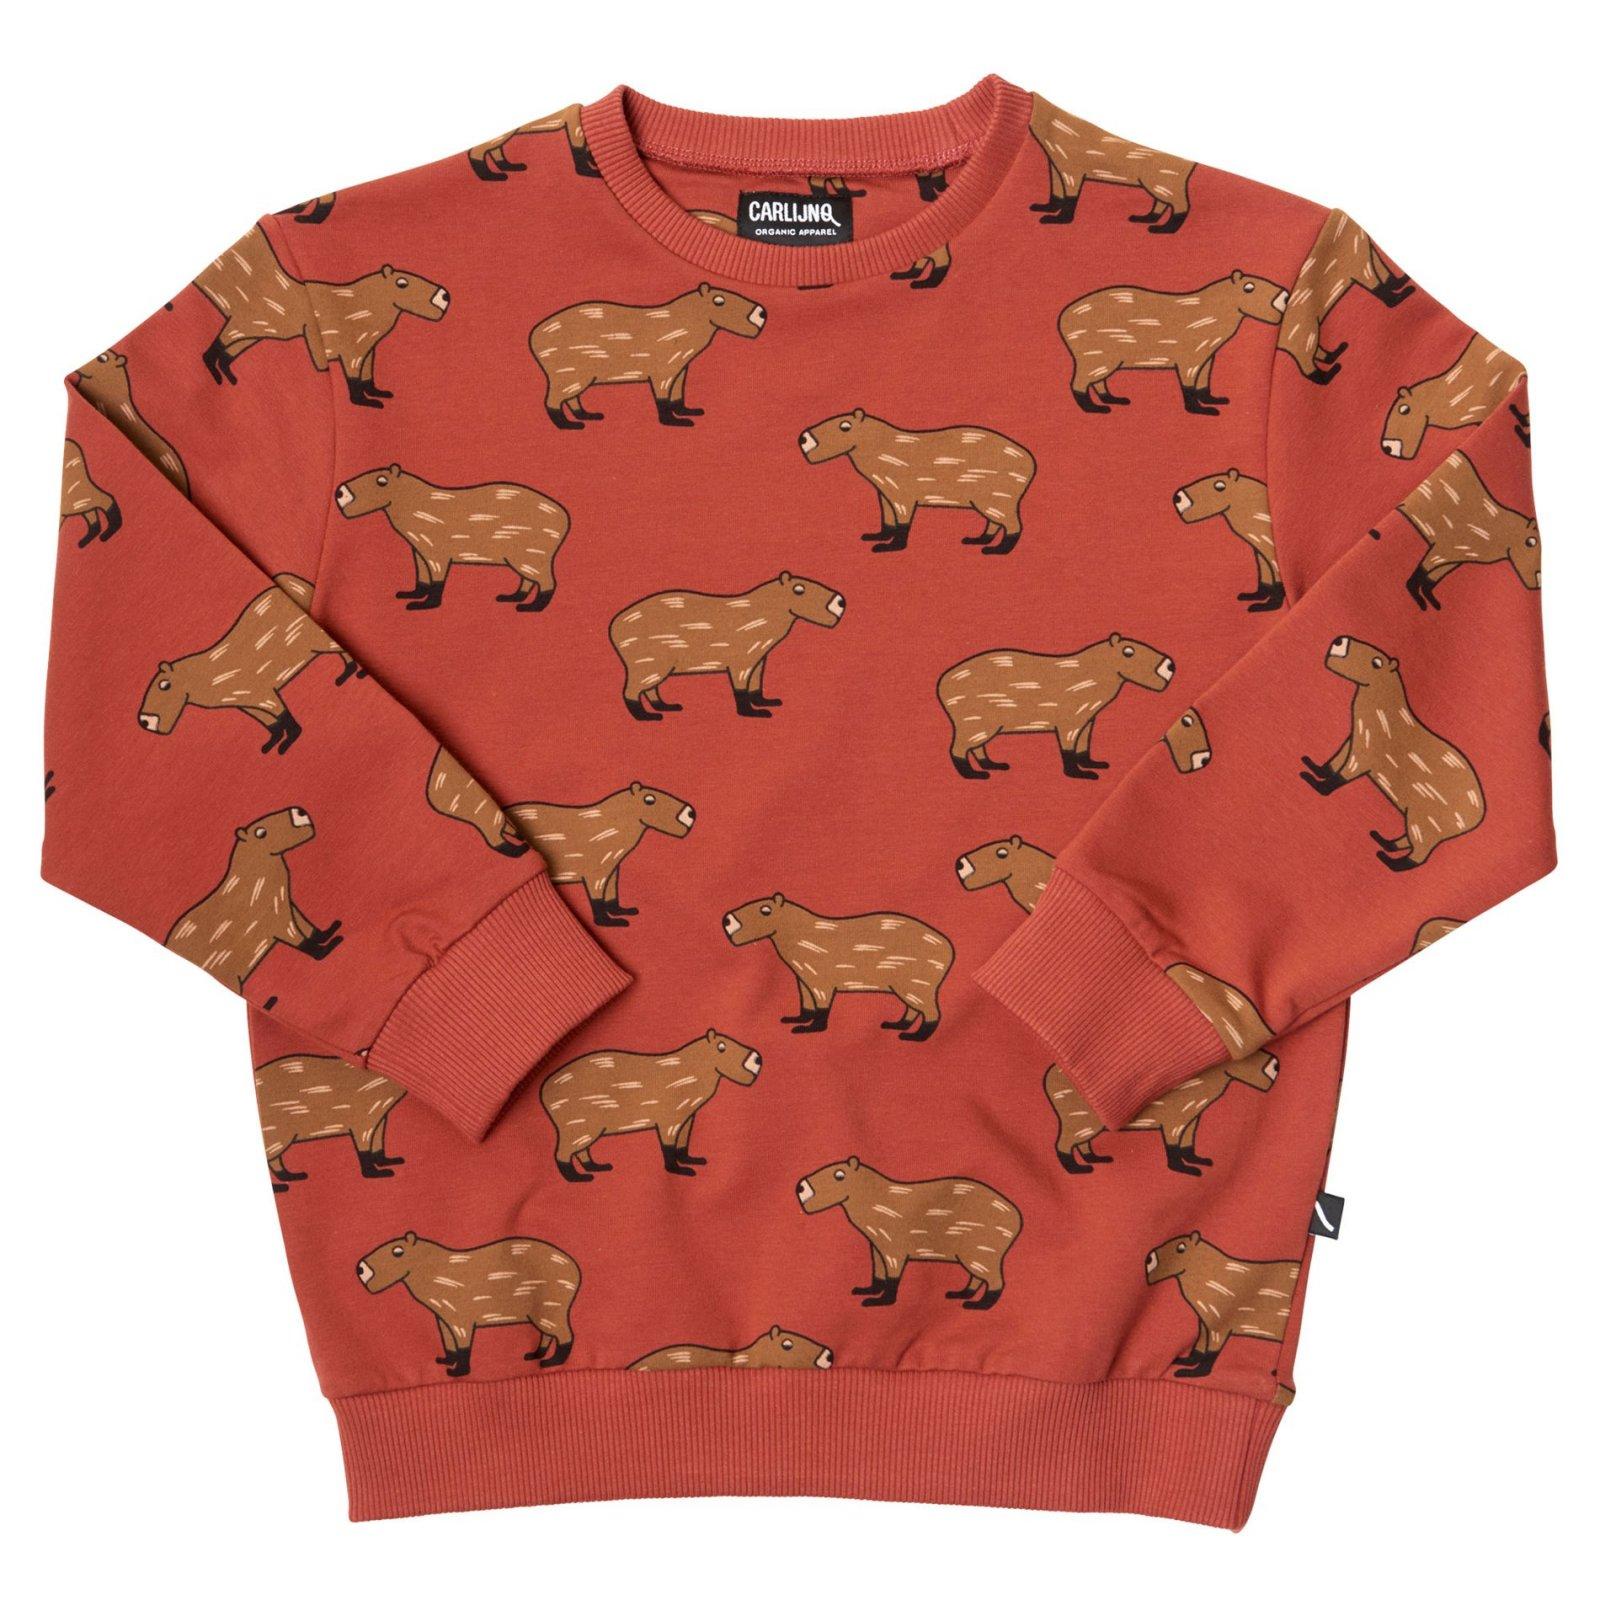 Capybara Sweater by Carlijnq